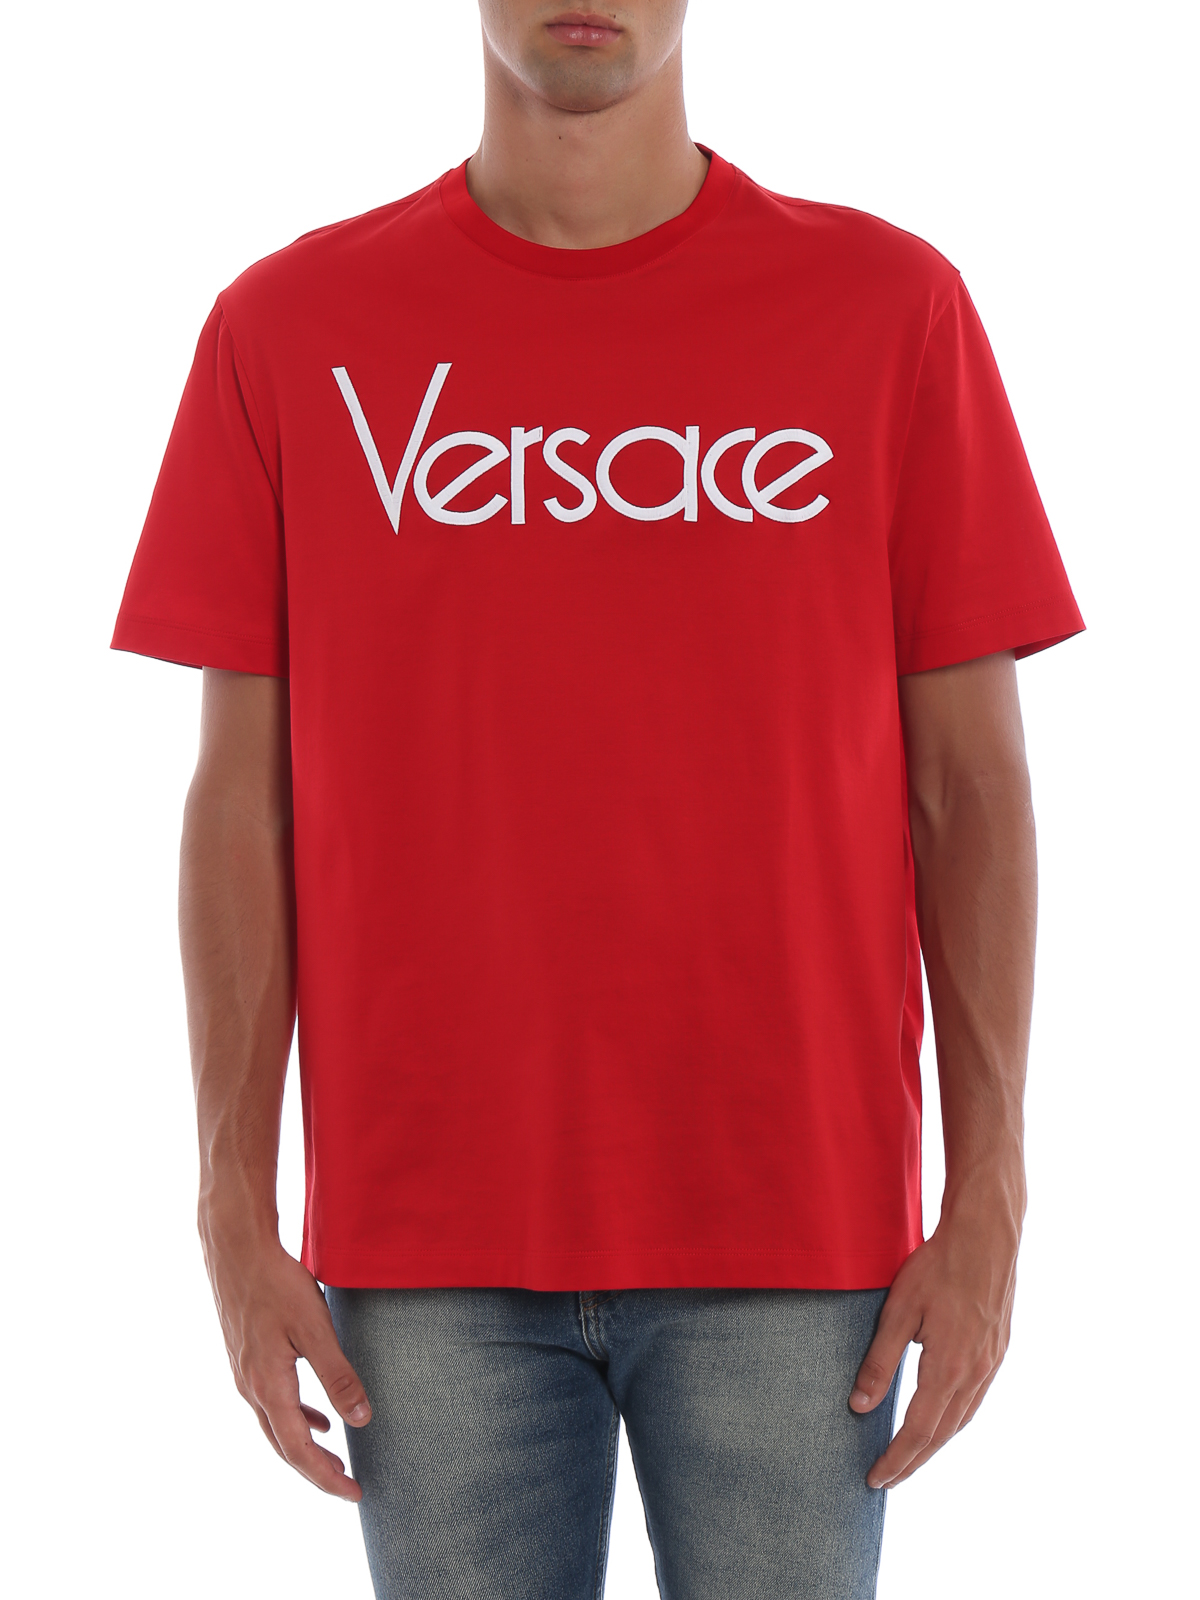 26b6a26c2f Vintage Logo T Shirt Versace – DACC